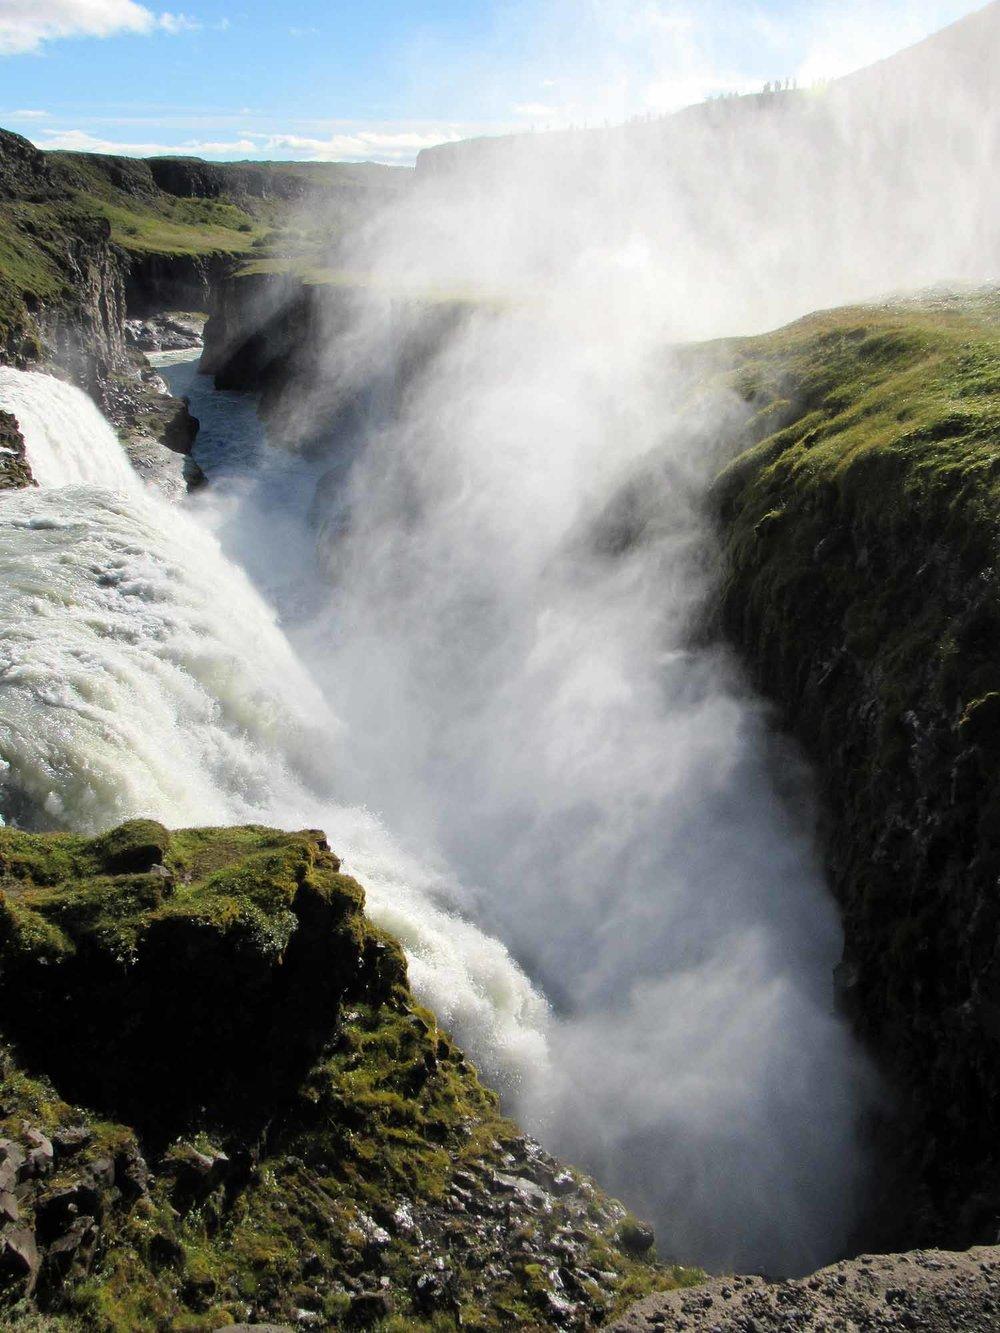 iceland-gullfoss-waterfall-canyon-gorge-mist.JPG